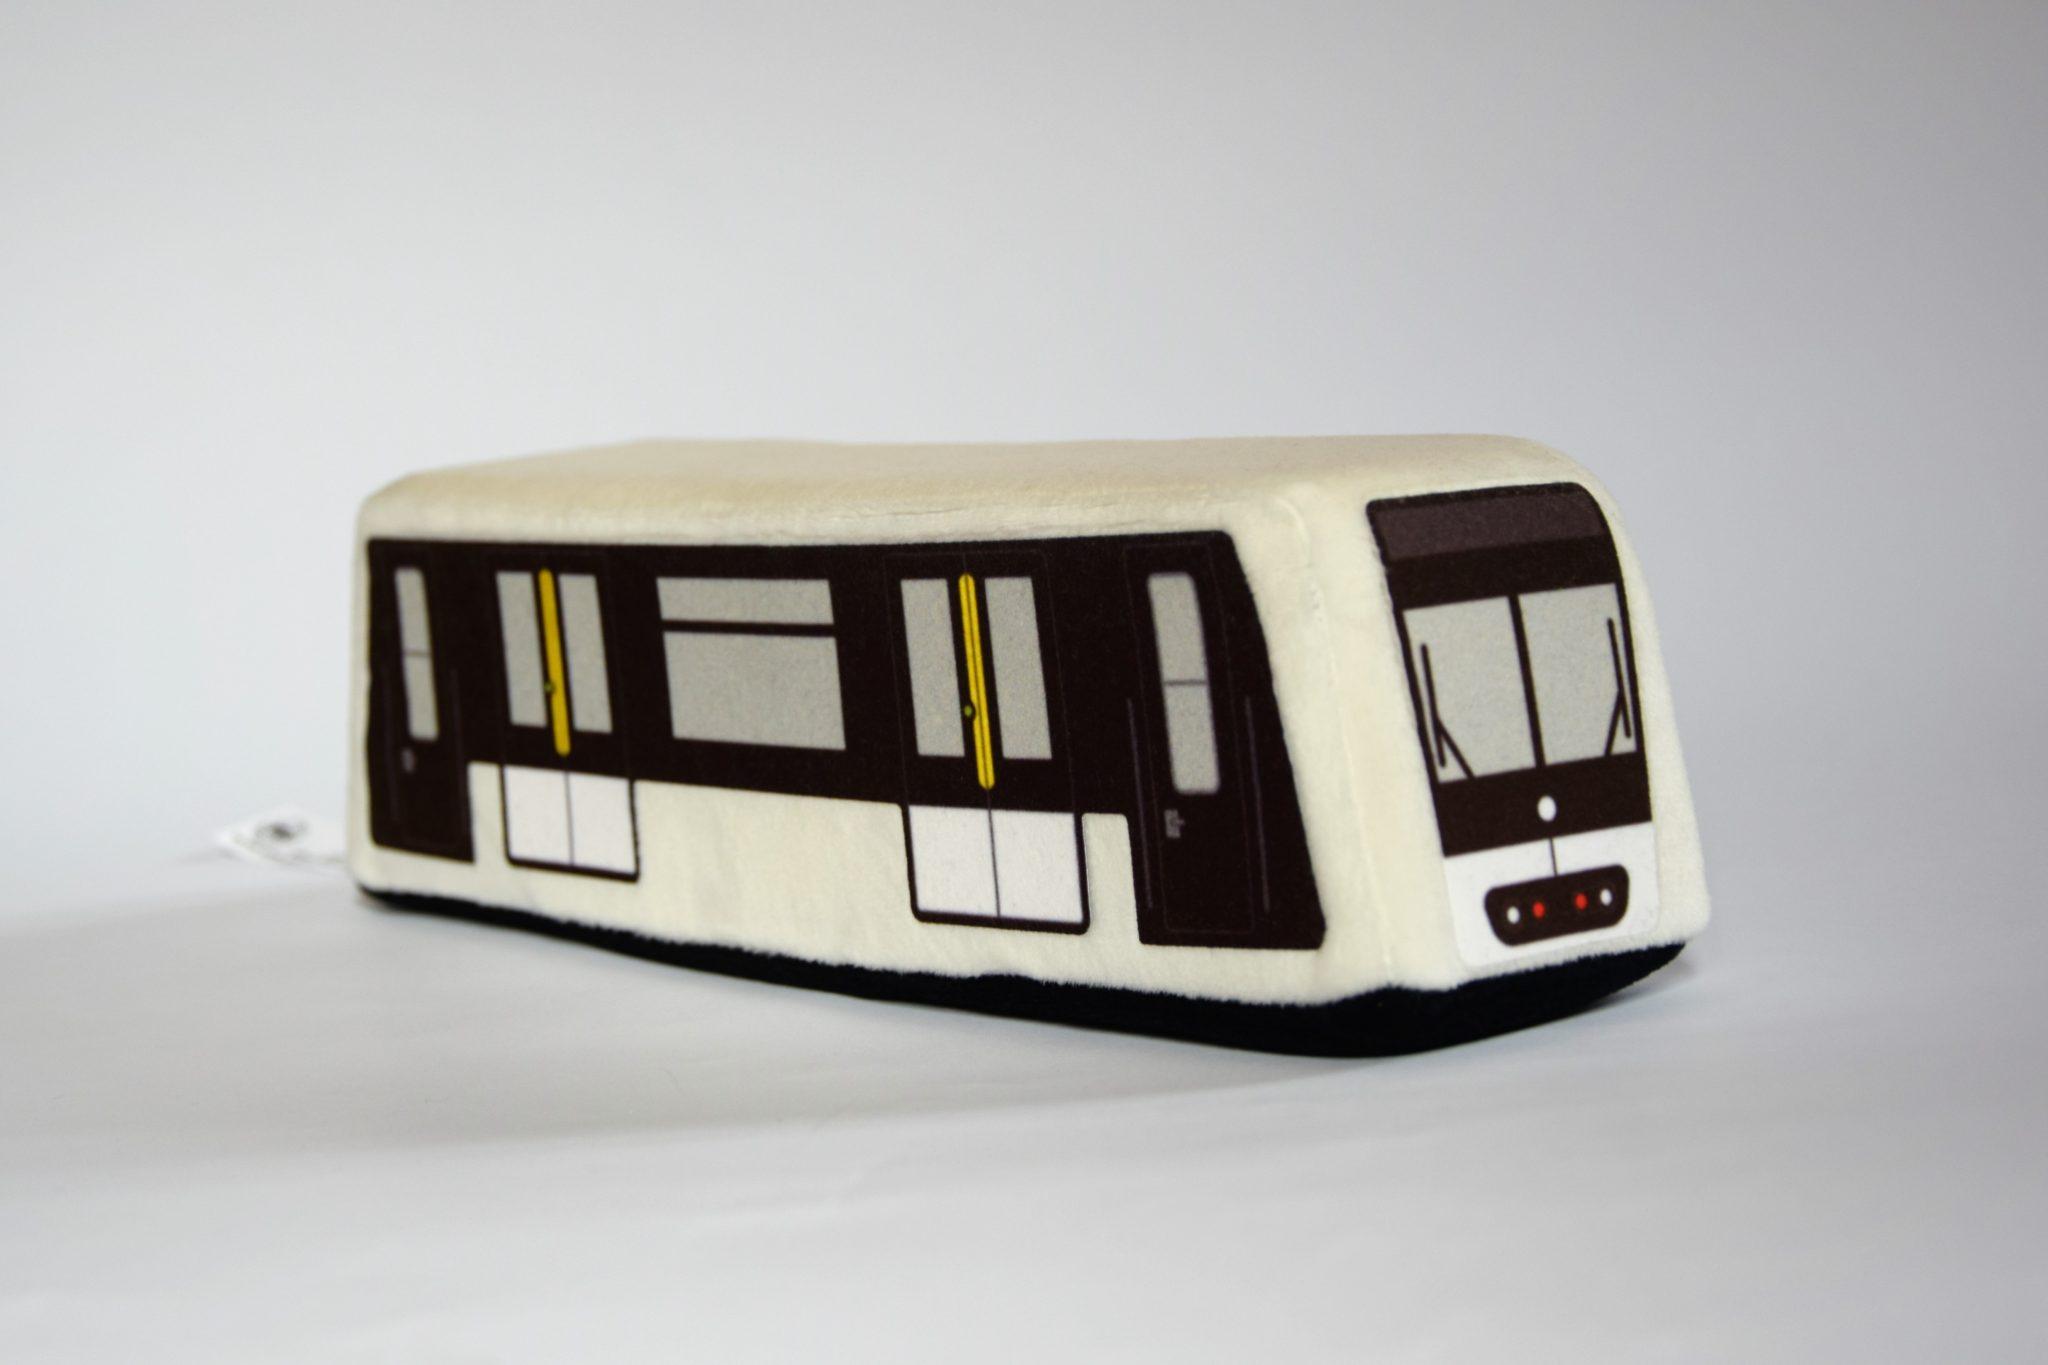 puha modern plüss metró képe